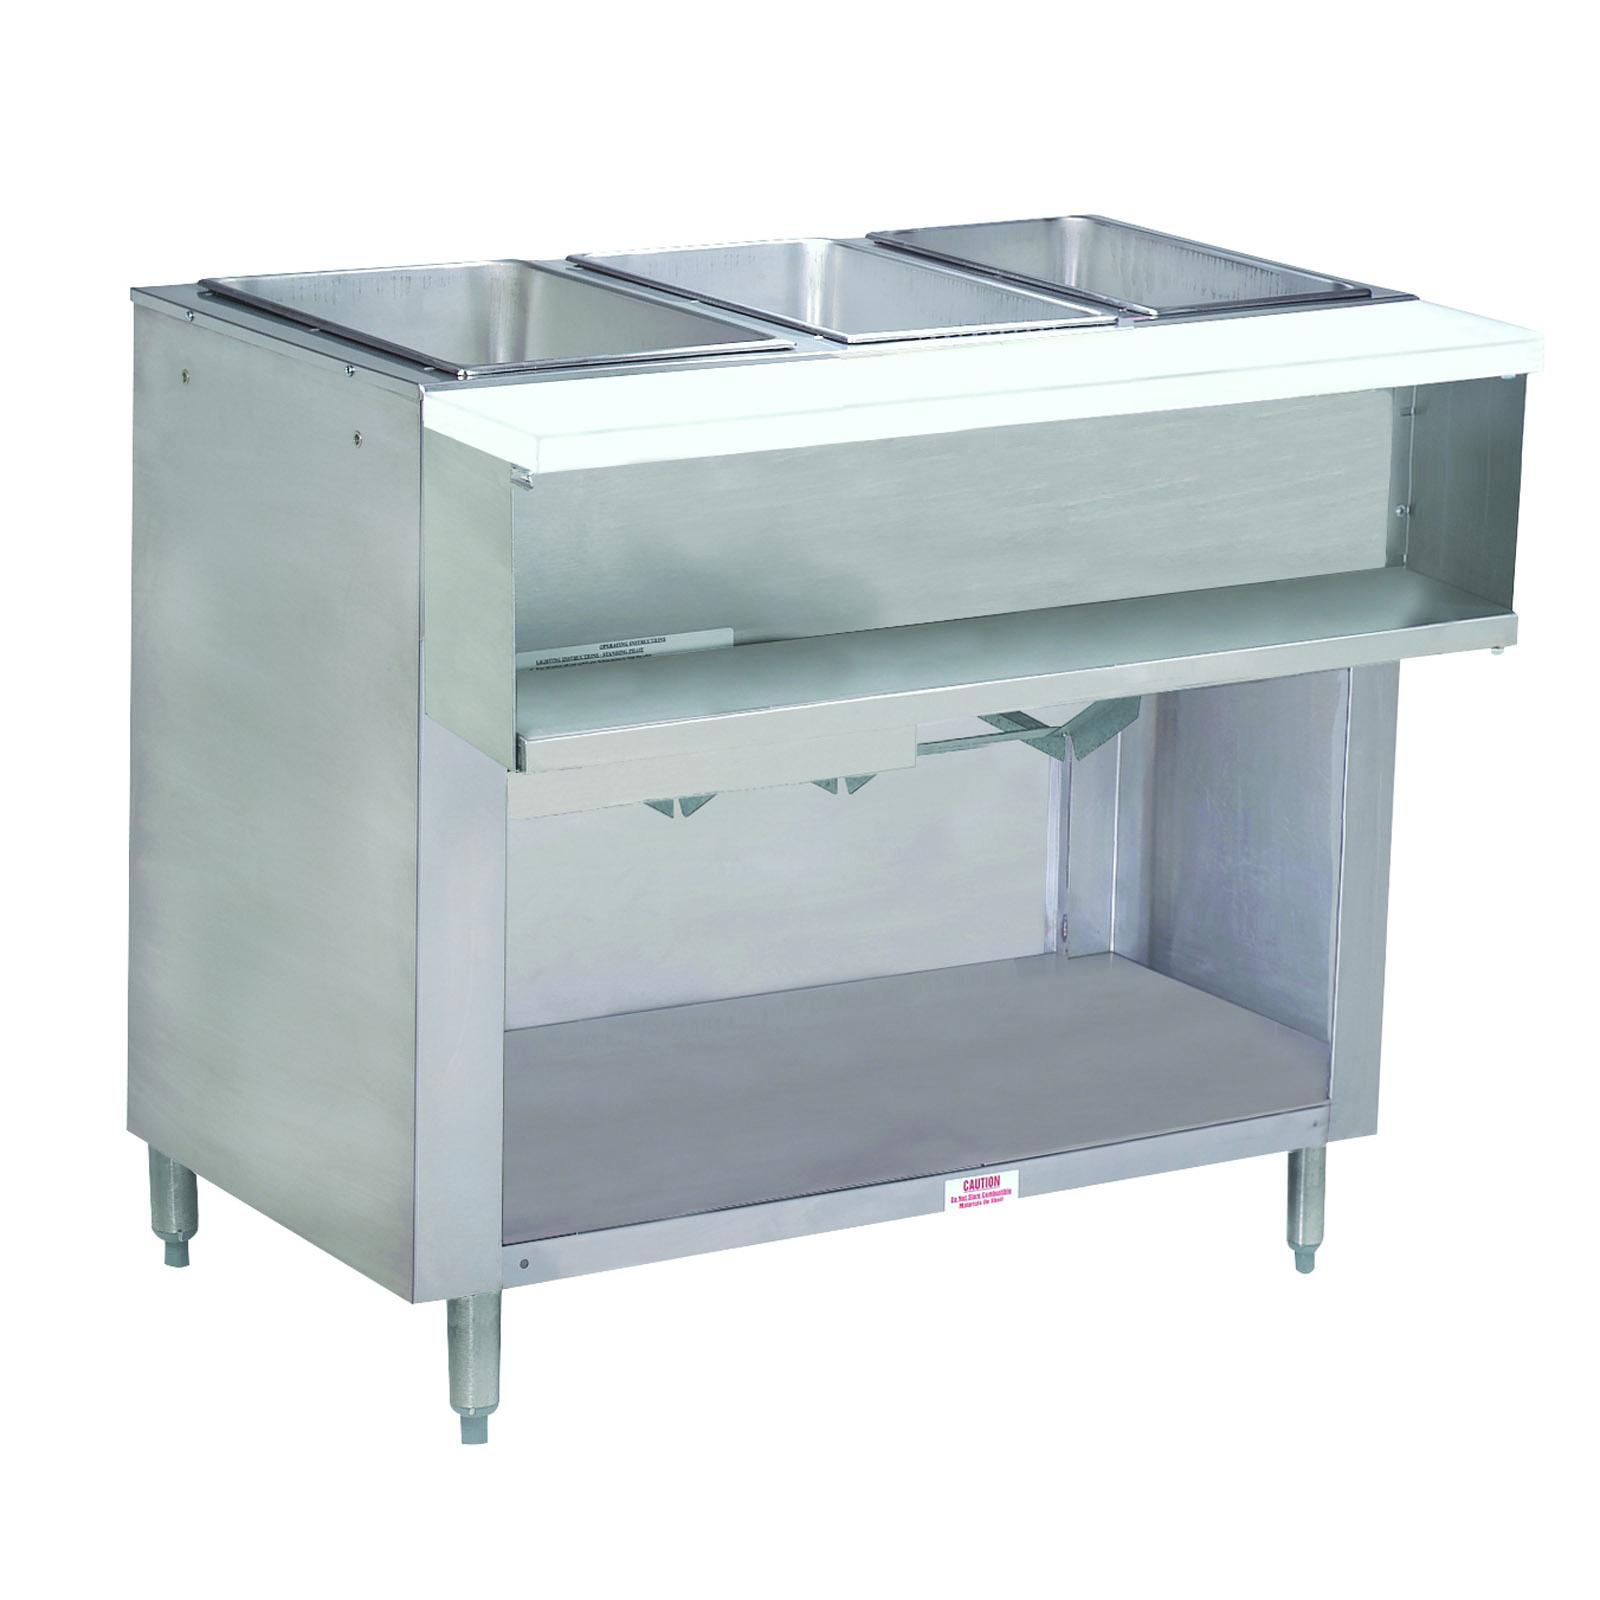 Advance Tabco WB-3G-NAT-BS serving counter, hot food, gas